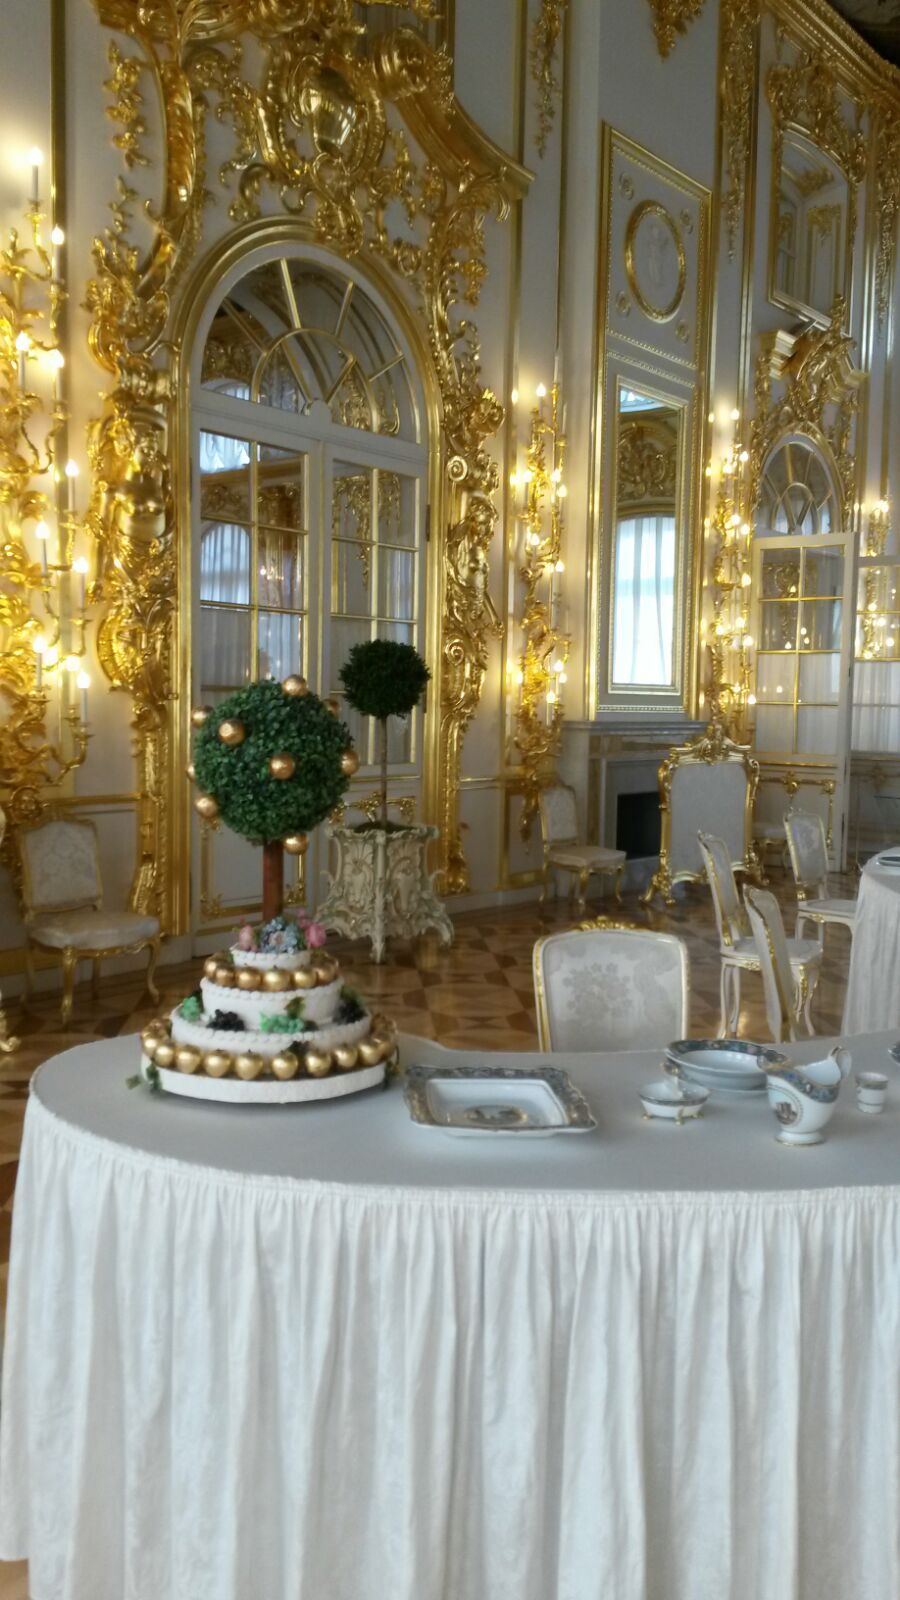 Oppulent eingedeckter Speisesaal im Katharinenpalast in St. Petersburg